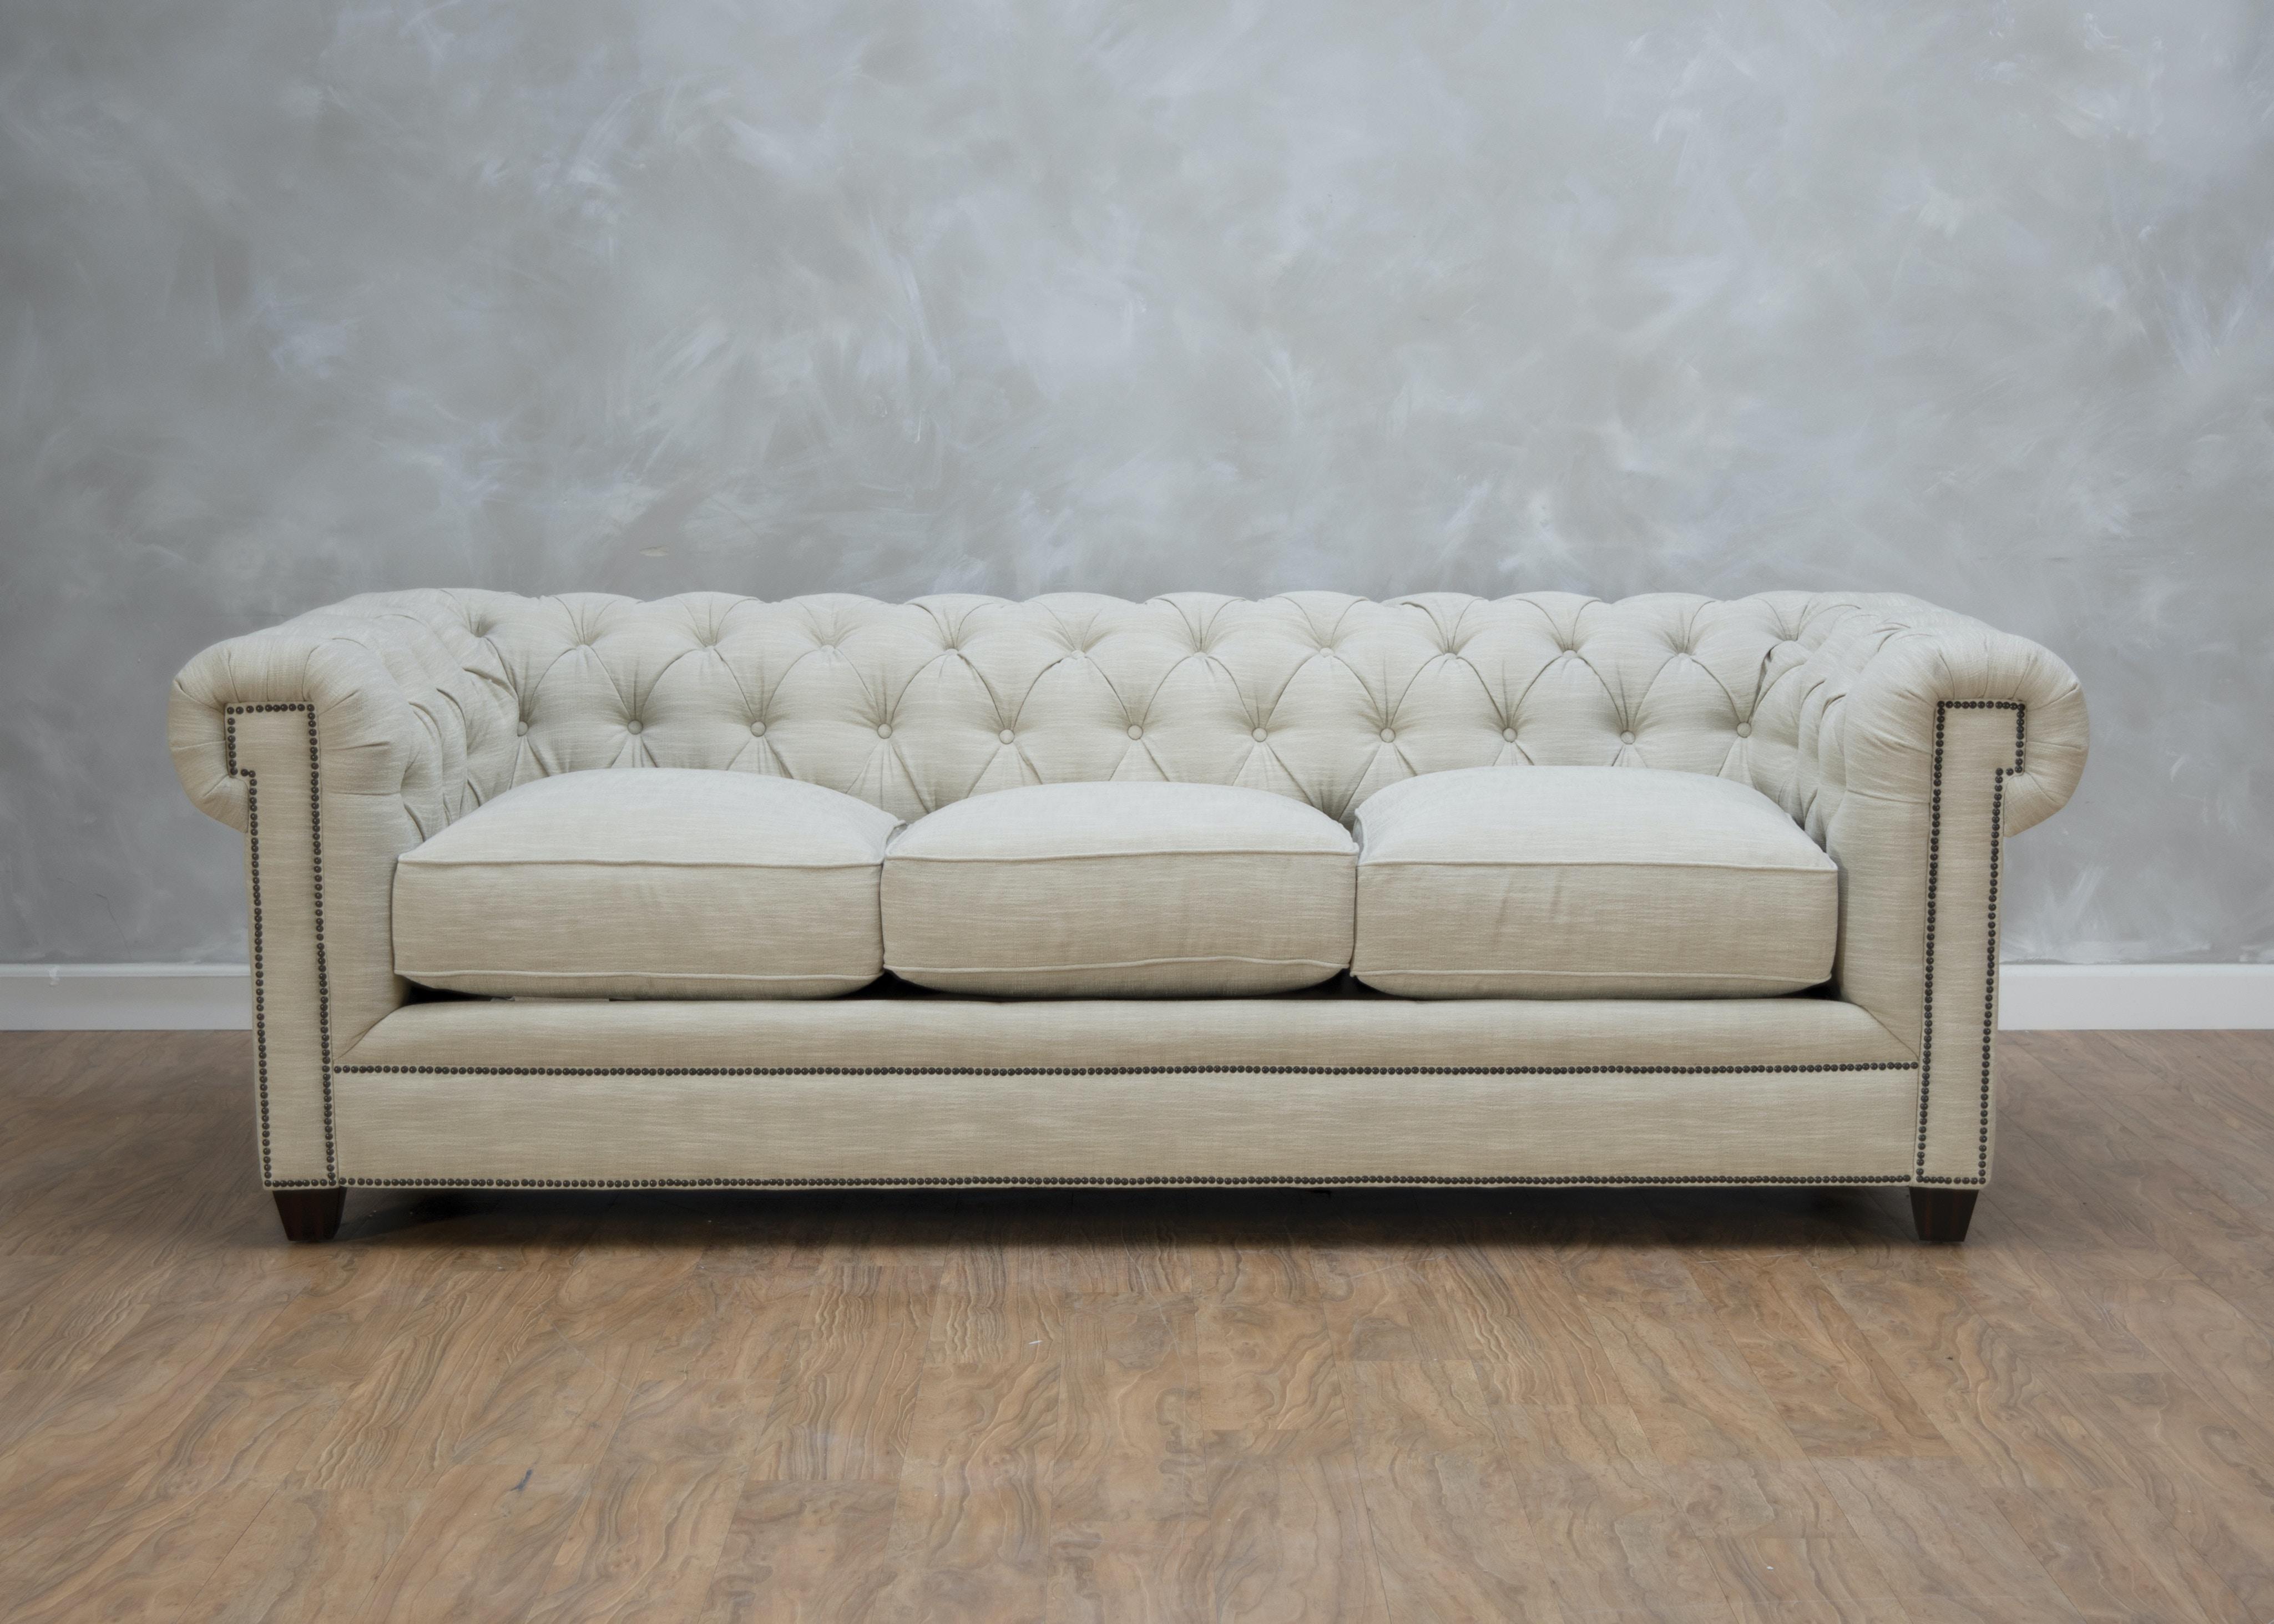 Rachlin Classics Kingston Sofa 552324